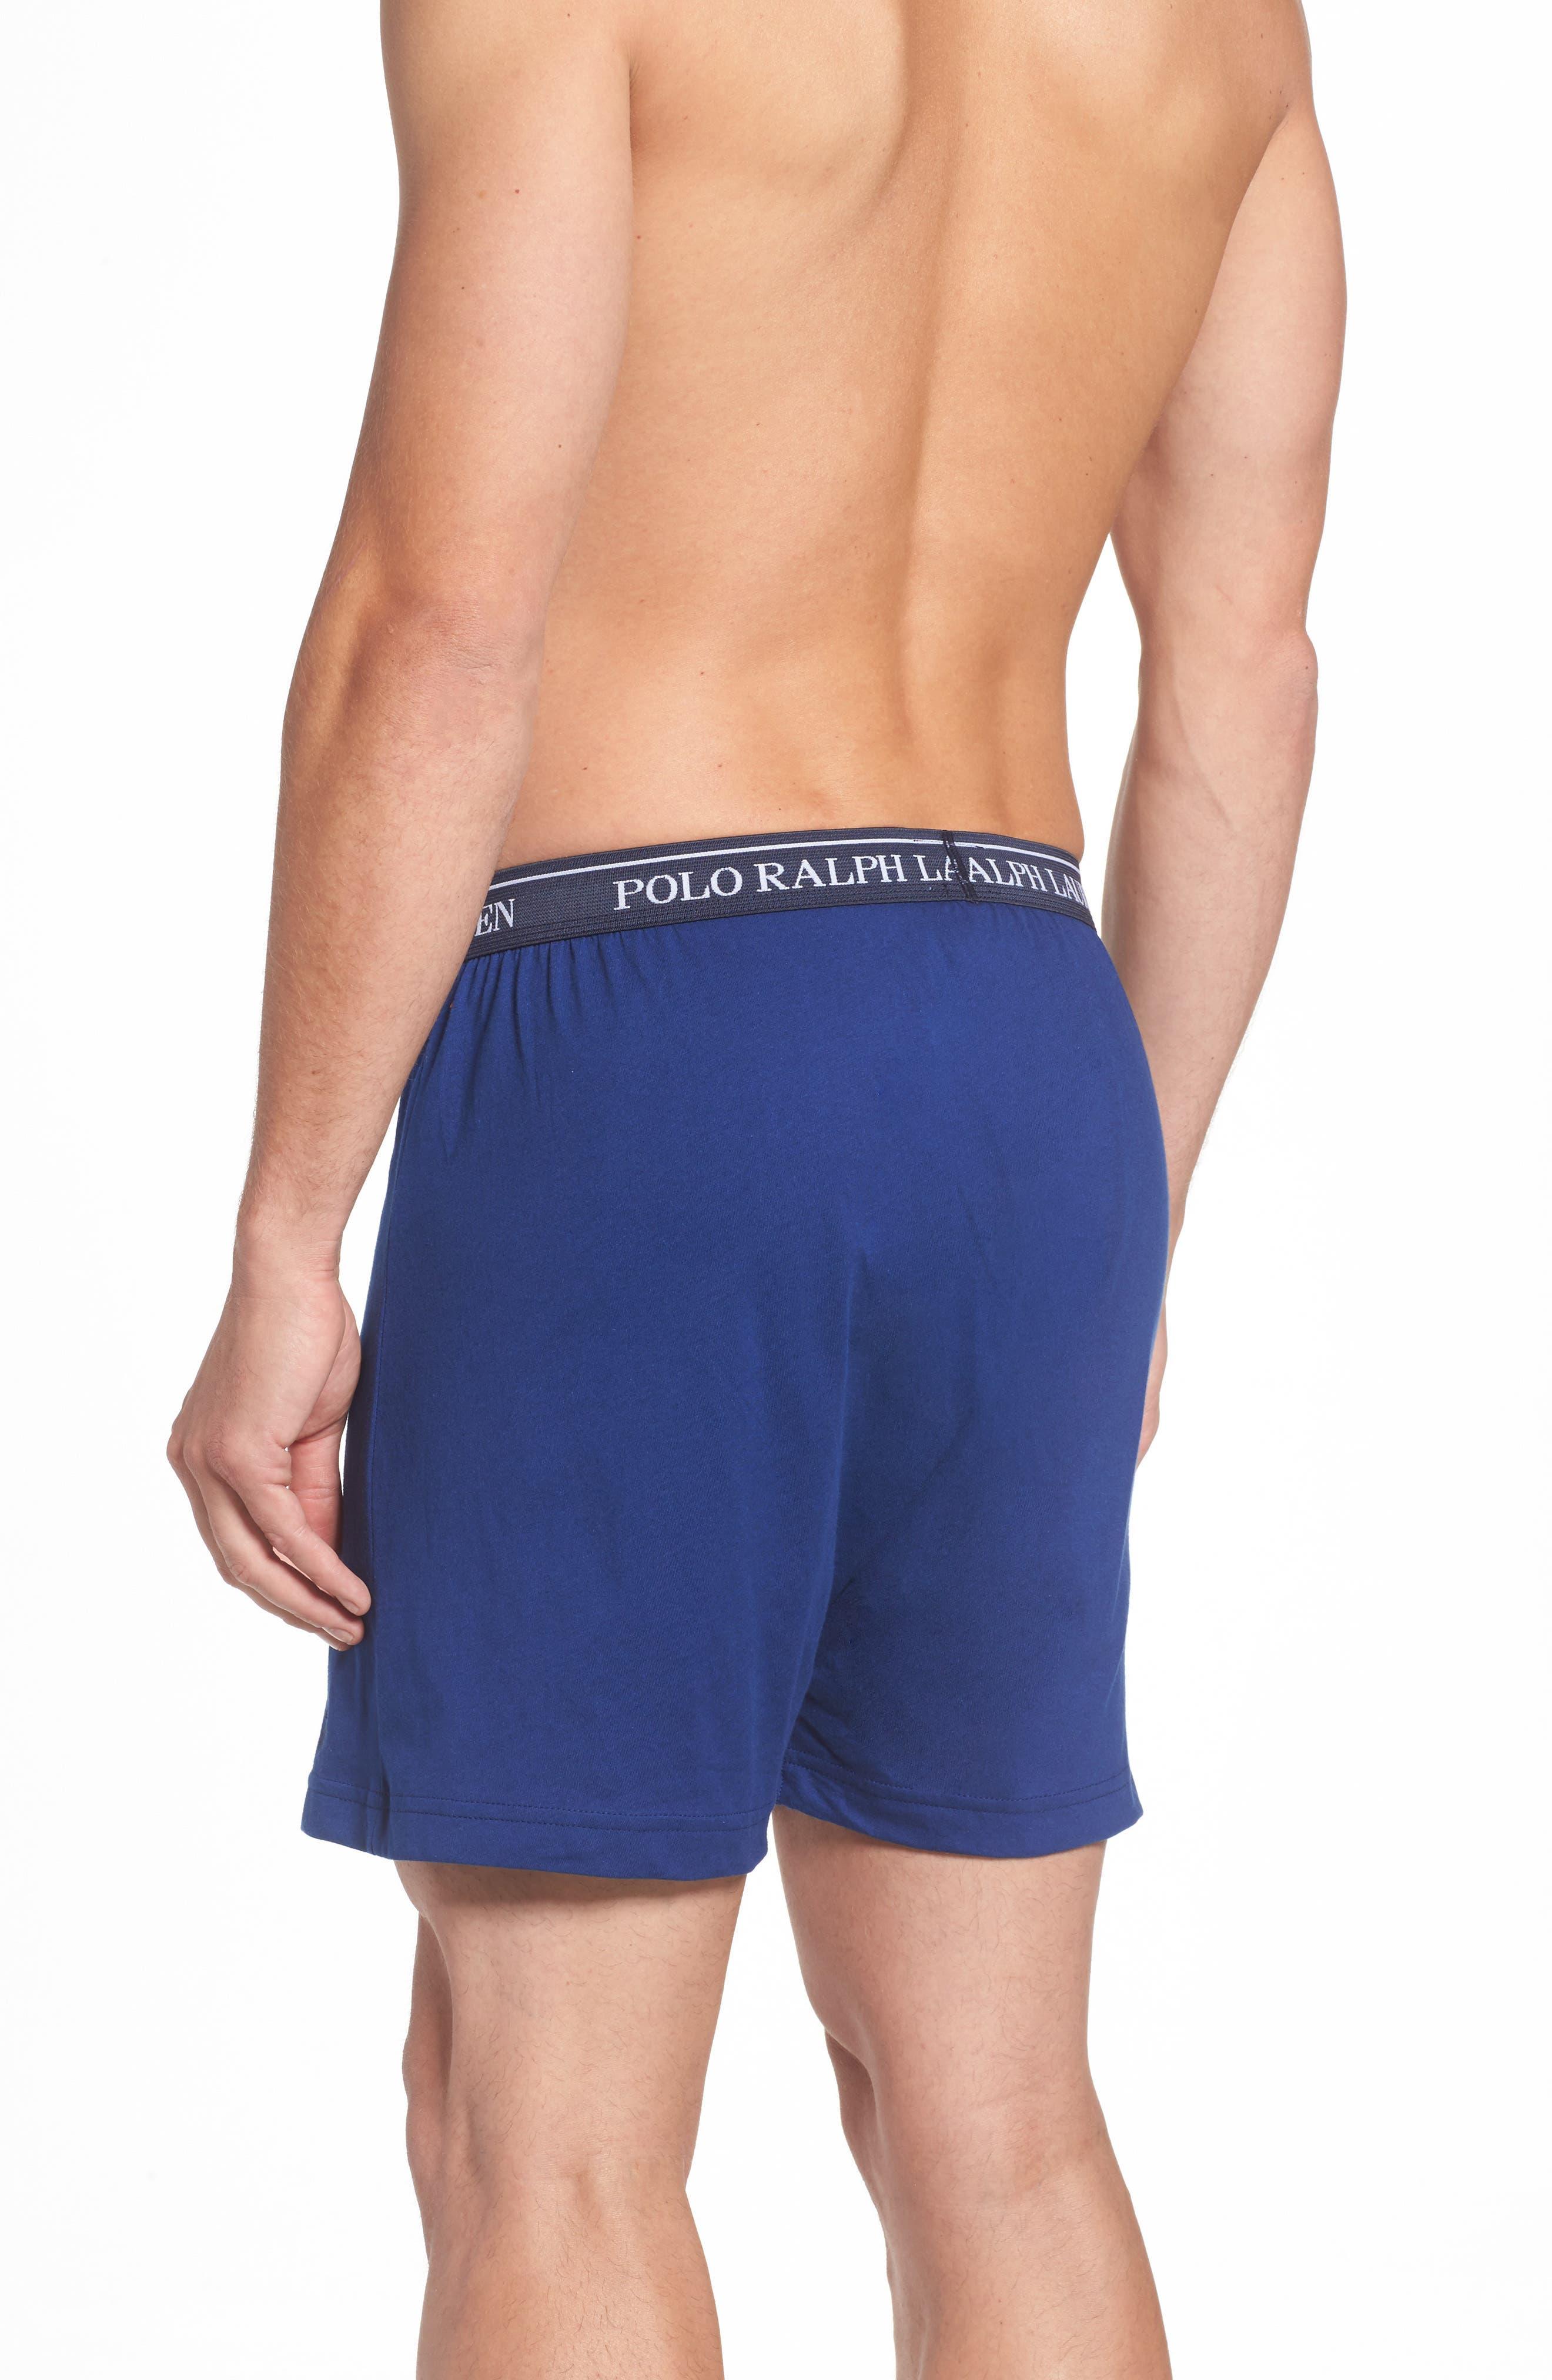 3-Pack Cotton Boxers,                             Alternate thumbnail 3, color,                             Club Royal Blue